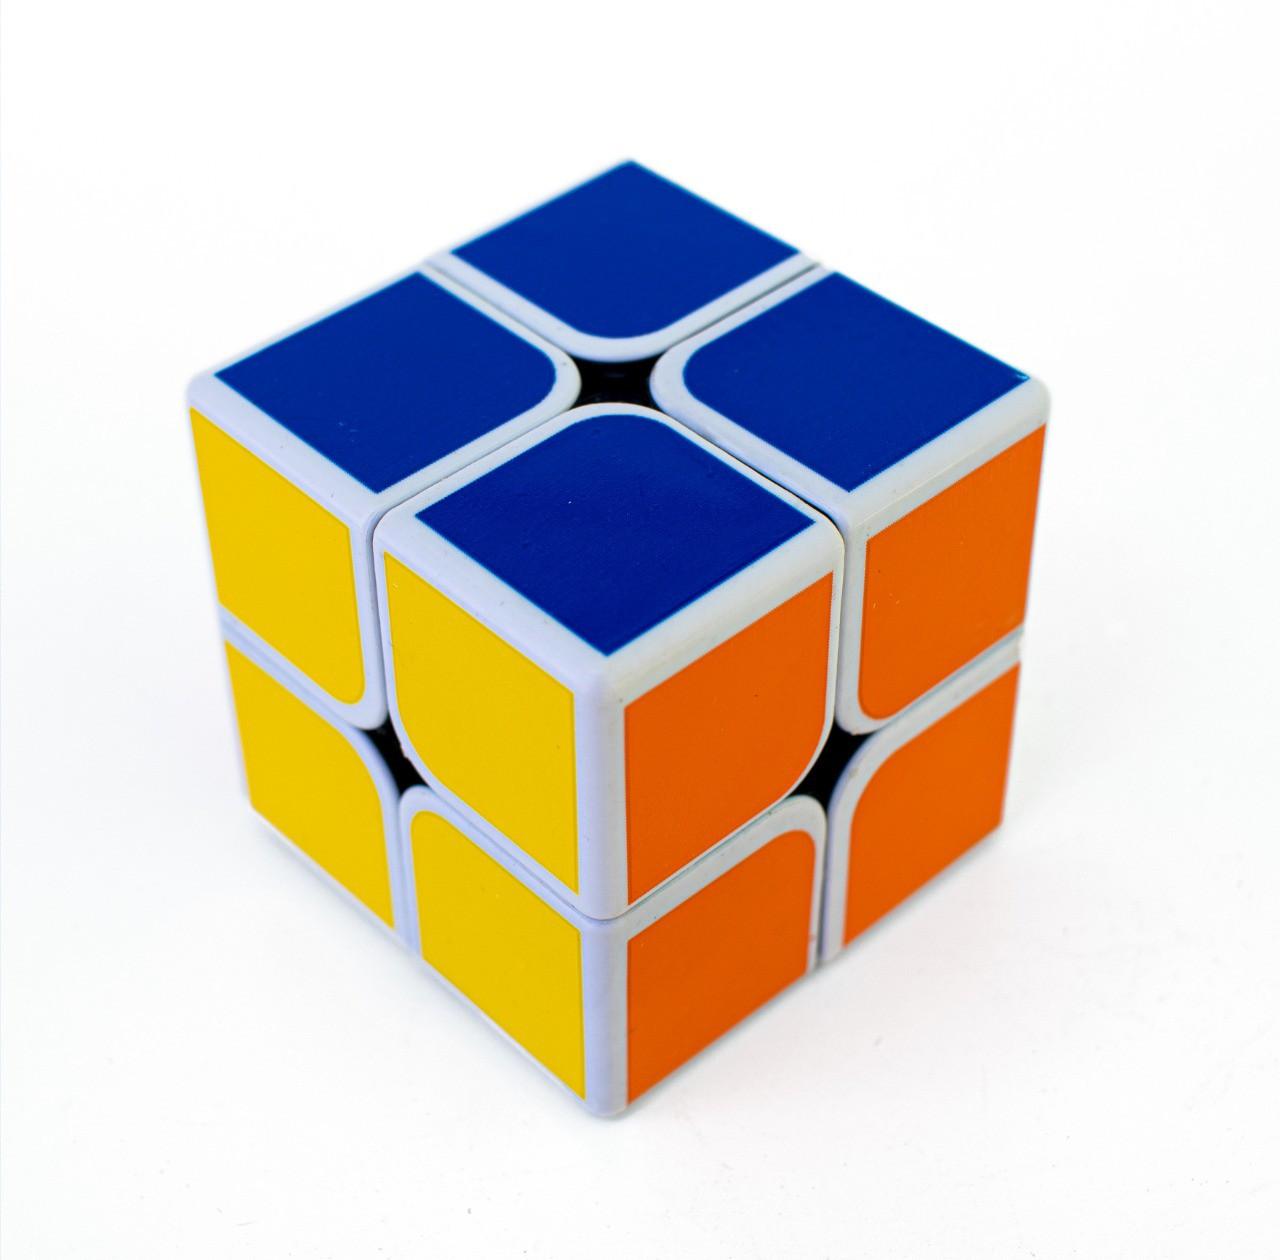 Cubo Mágico 2x2x2 Profissional Movimentos Interativo